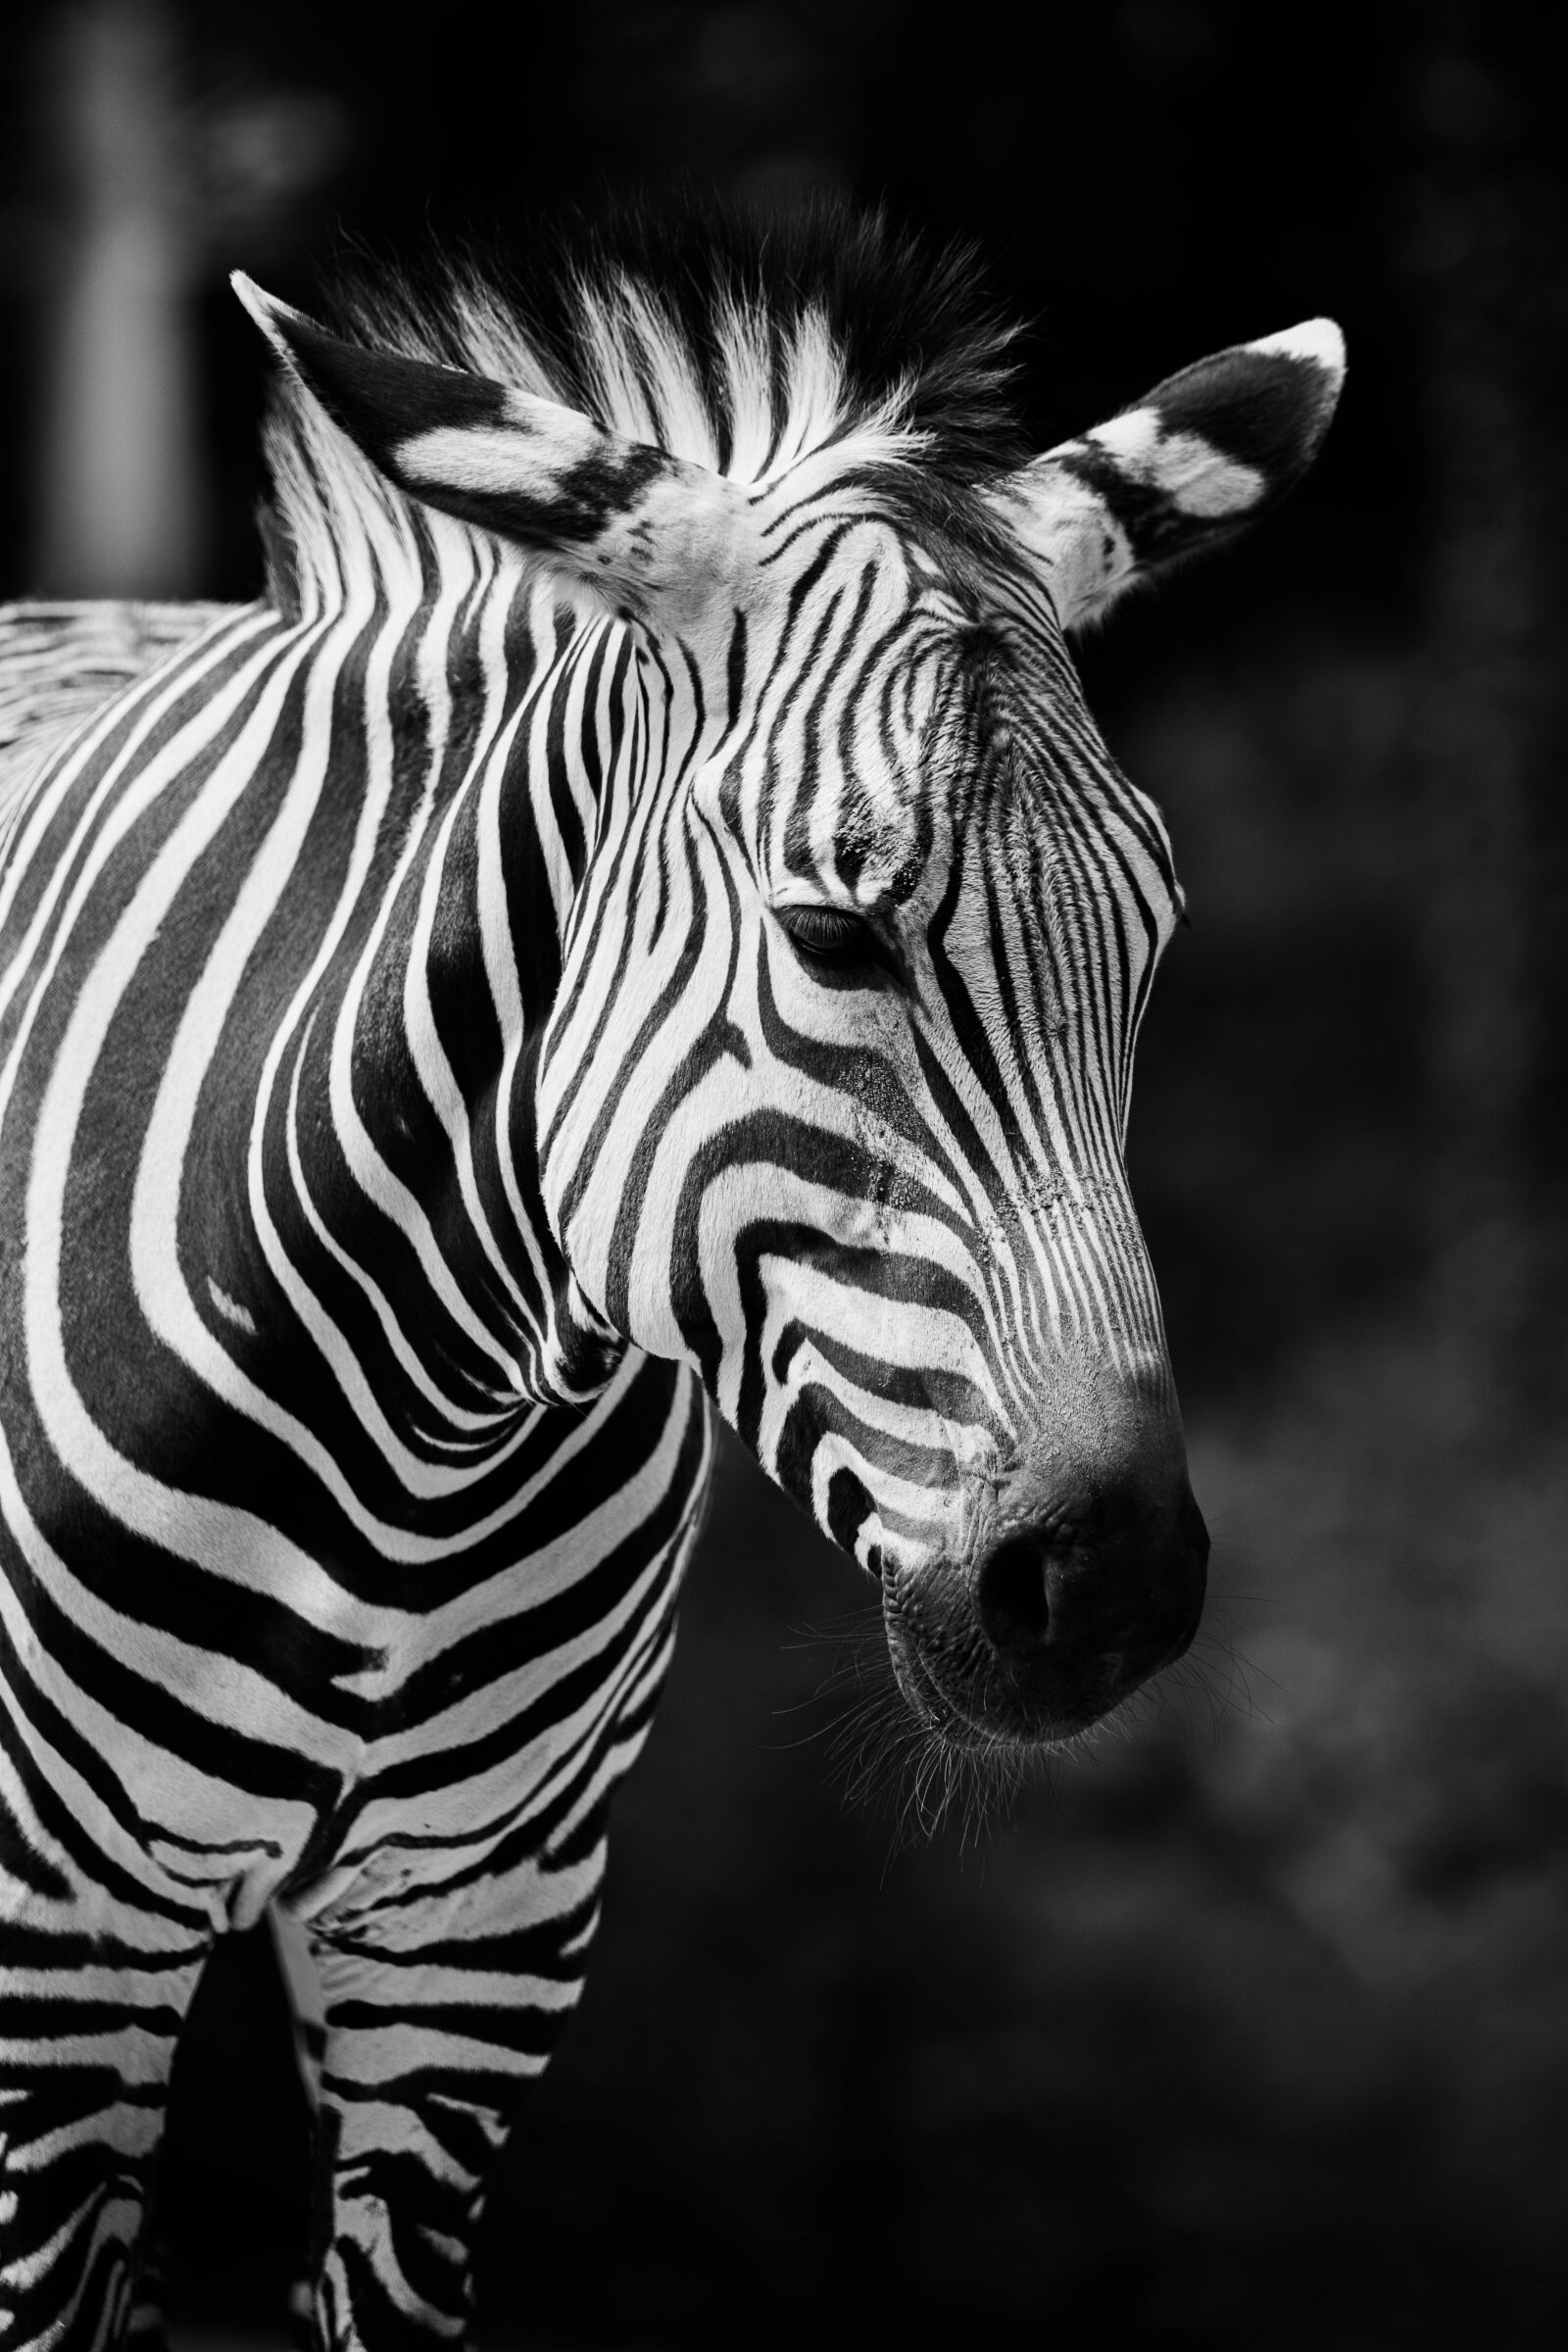 zebra, africa, poaching